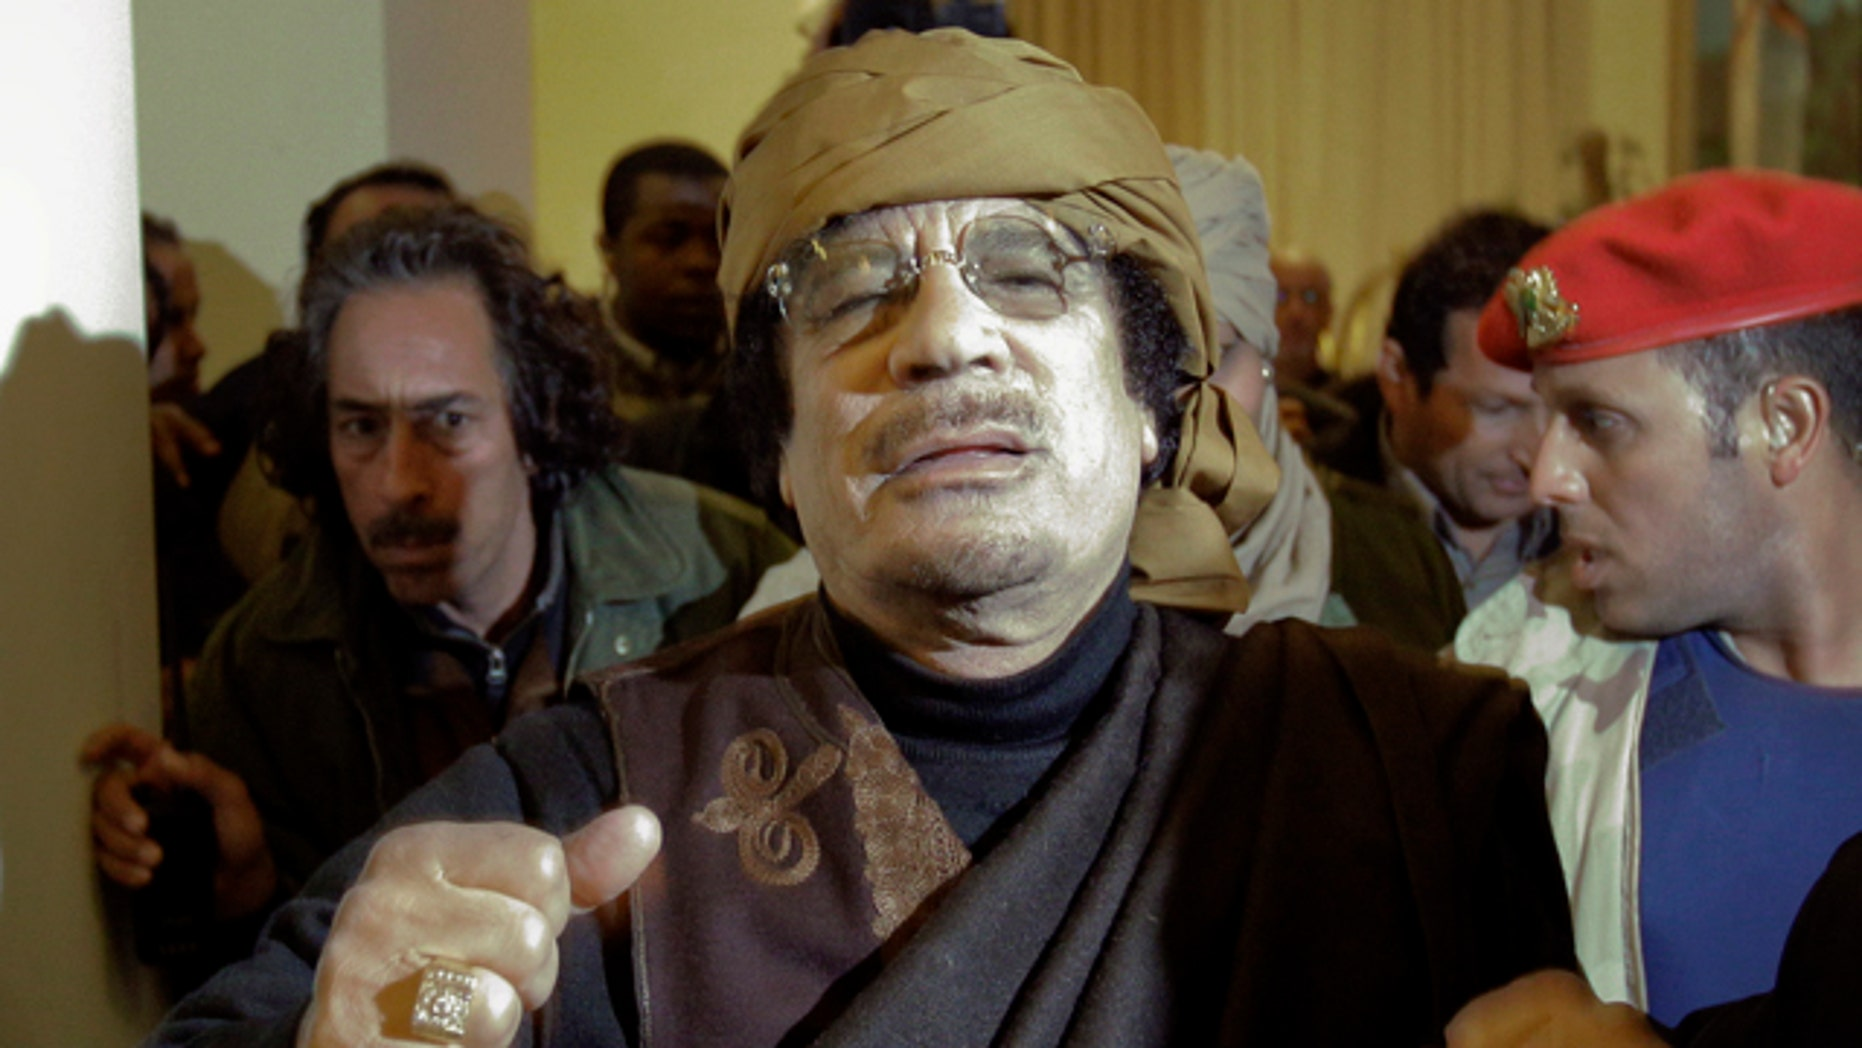 March 8: Libyan Leader Muammar Qaddafi arrives at a hotel to give television interviews in Tripoli, Libya.